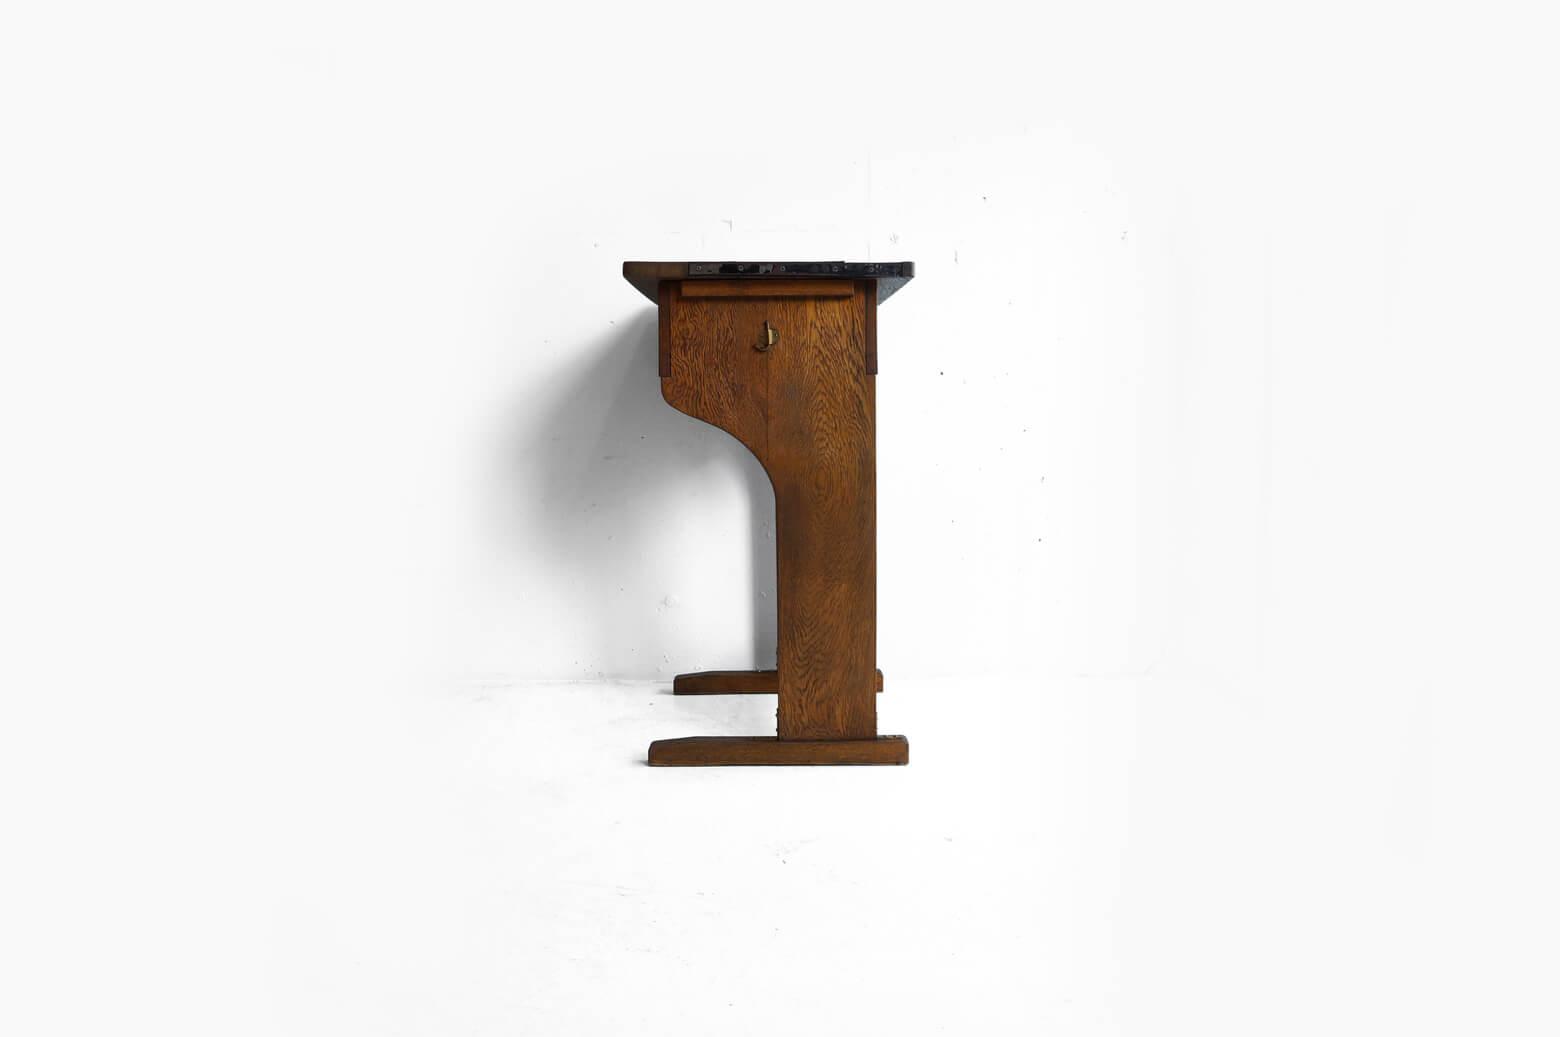 Vintage Wooden School Desk/ヴィンテージ スクールデスク 学校机 レトロ テーブル 3